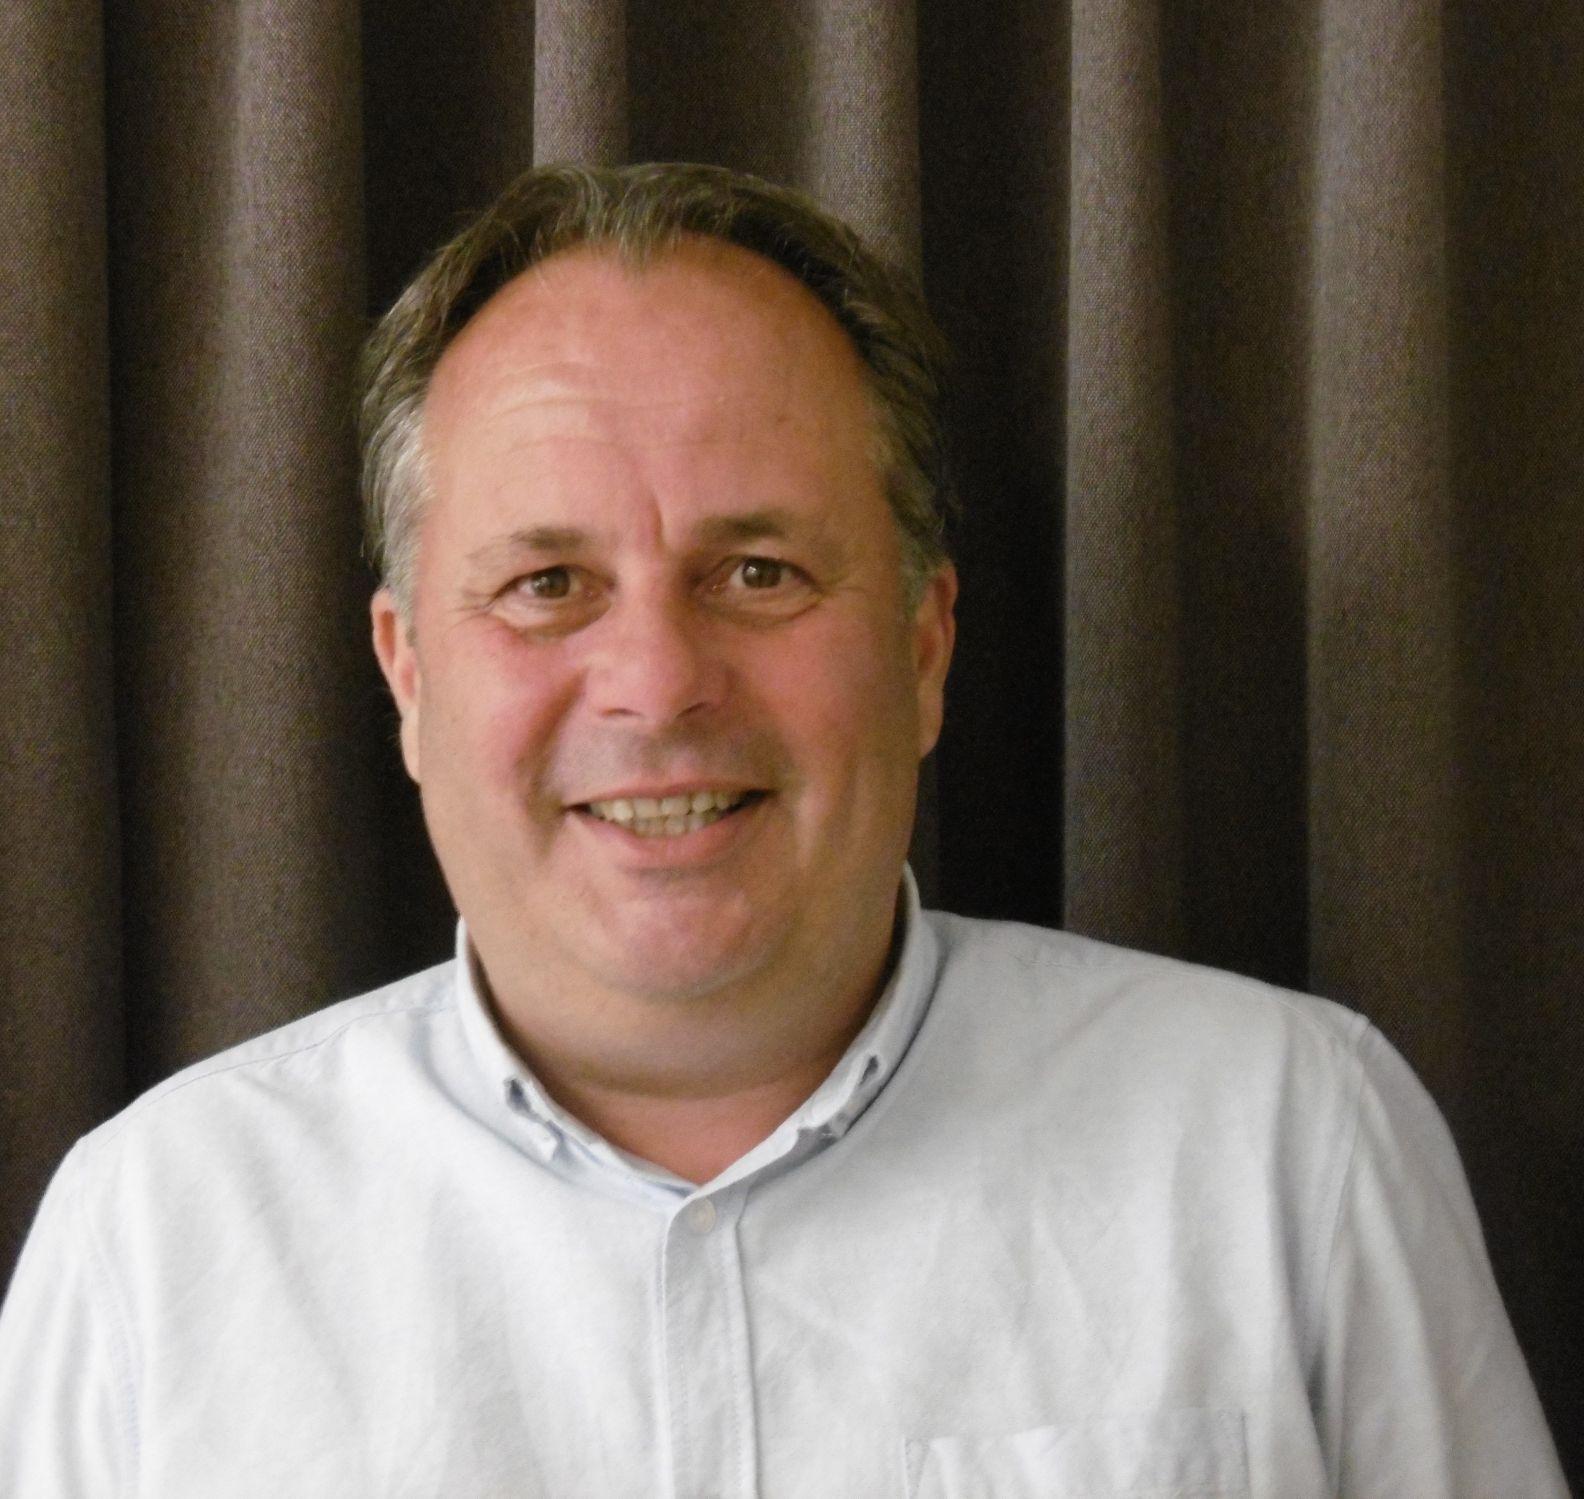 Mark Fokker